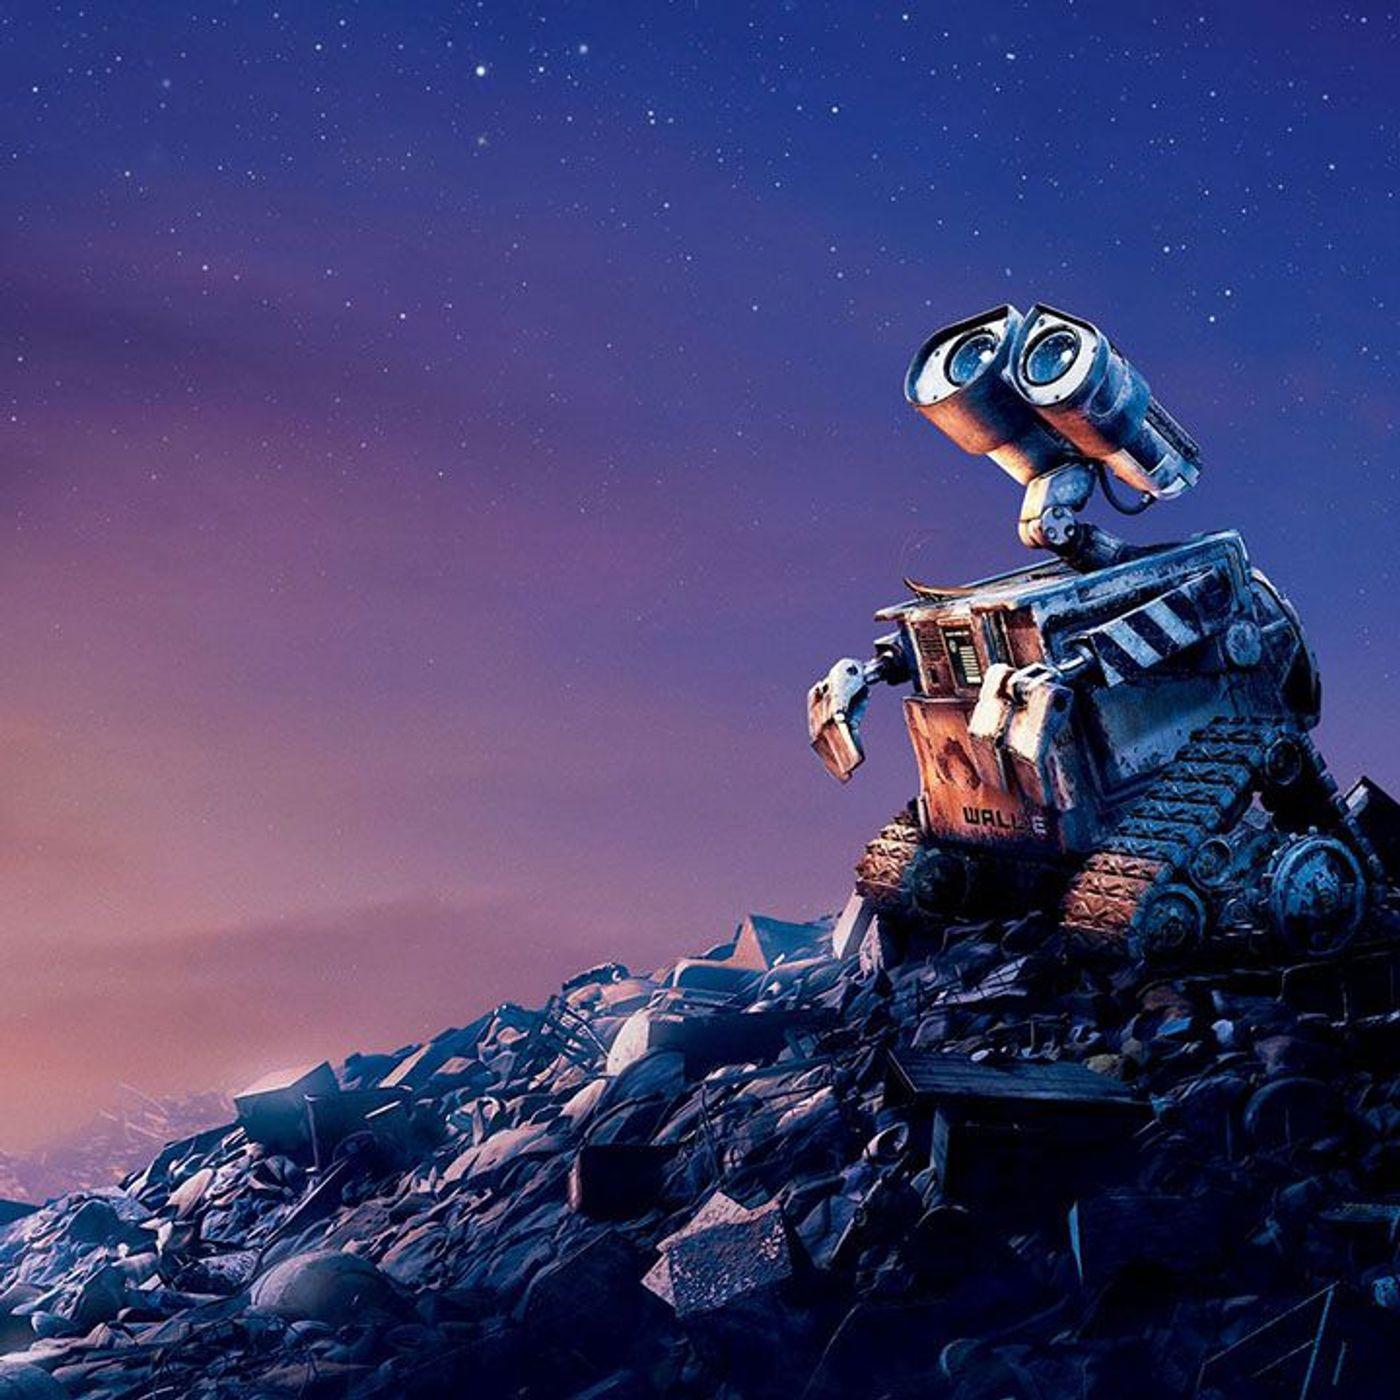 Spazzatura e futuro: Wall-E Vs Tiny Robots